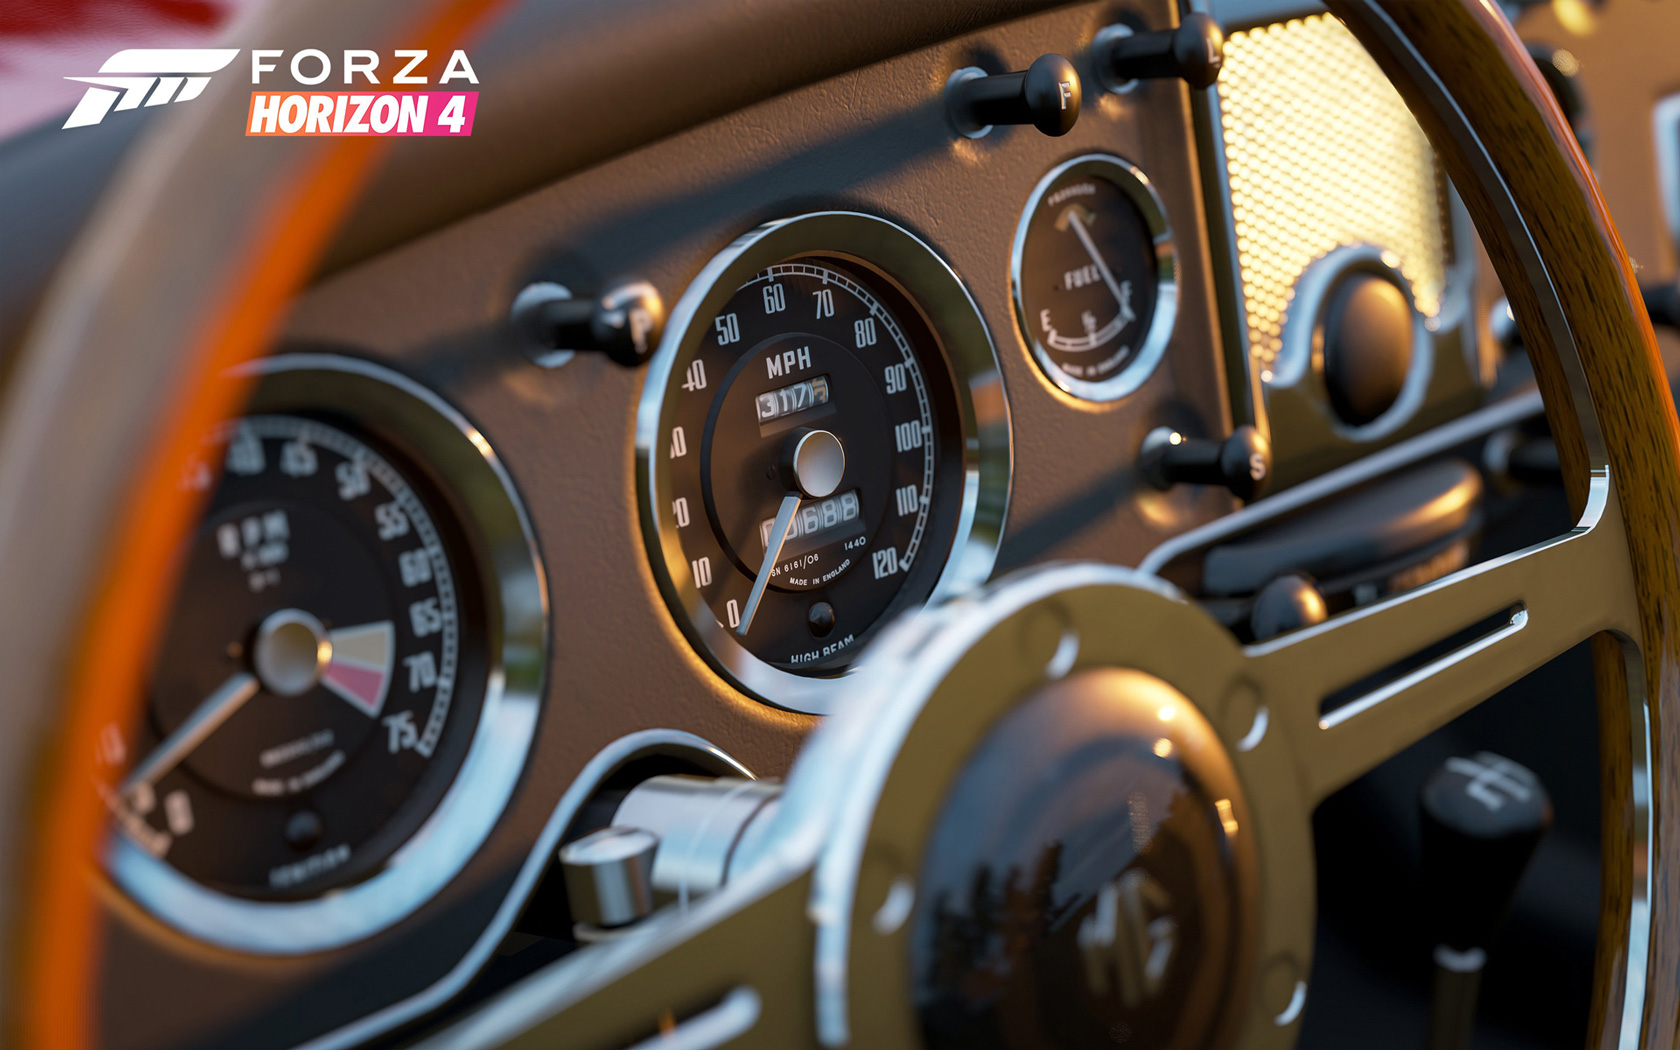 Free Forza Horizon 4 Wallpaper in 1680x1050